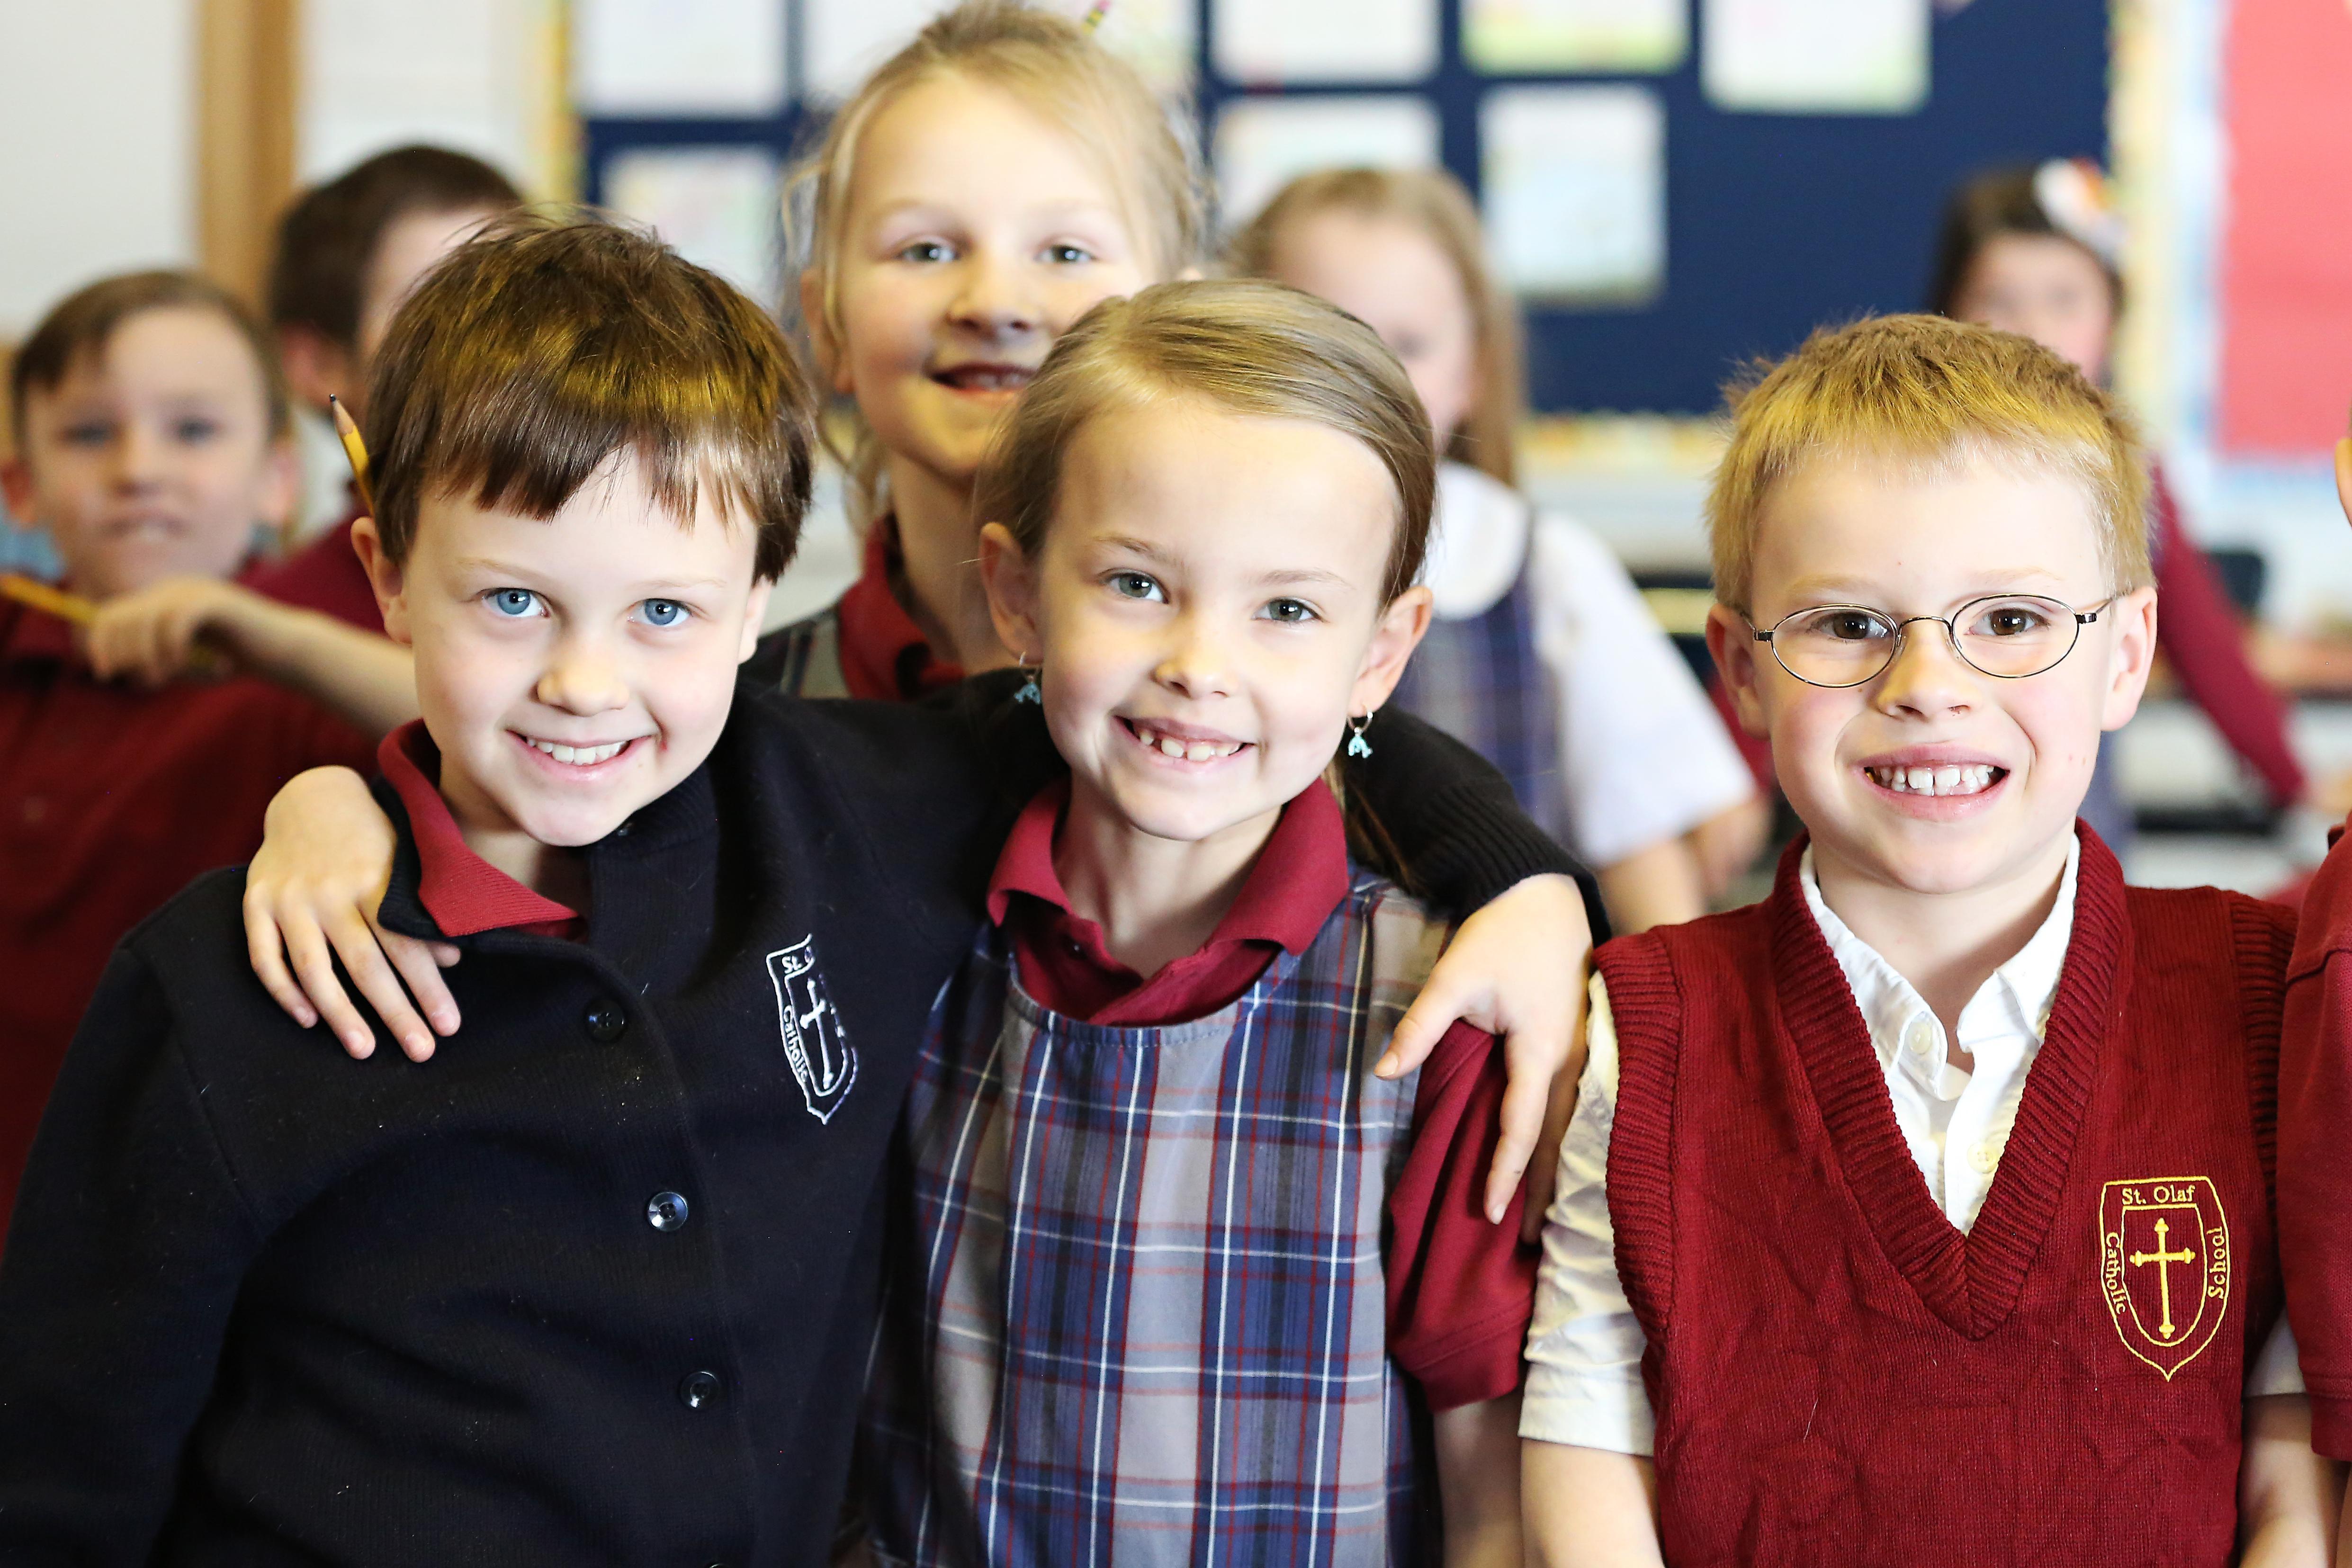 Uniforms – Admissions – Saint Olaf Catholic School